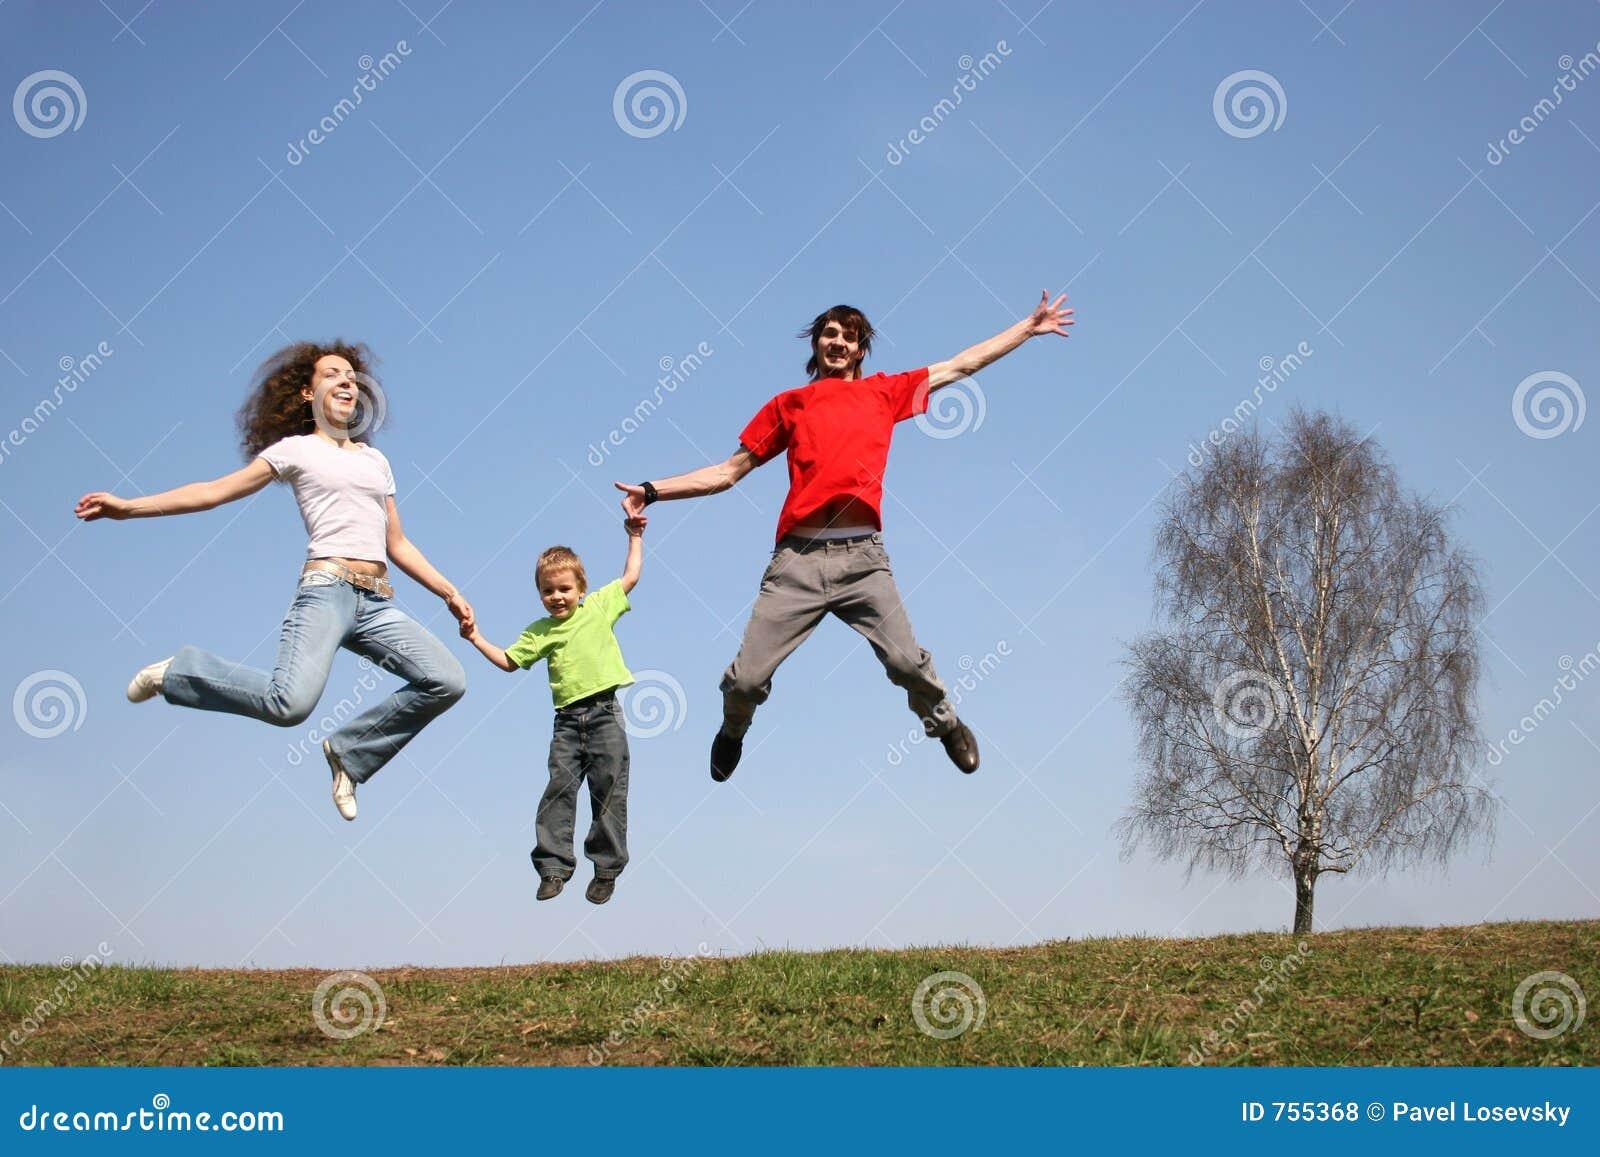 jumping family spring royalty free stock photos image